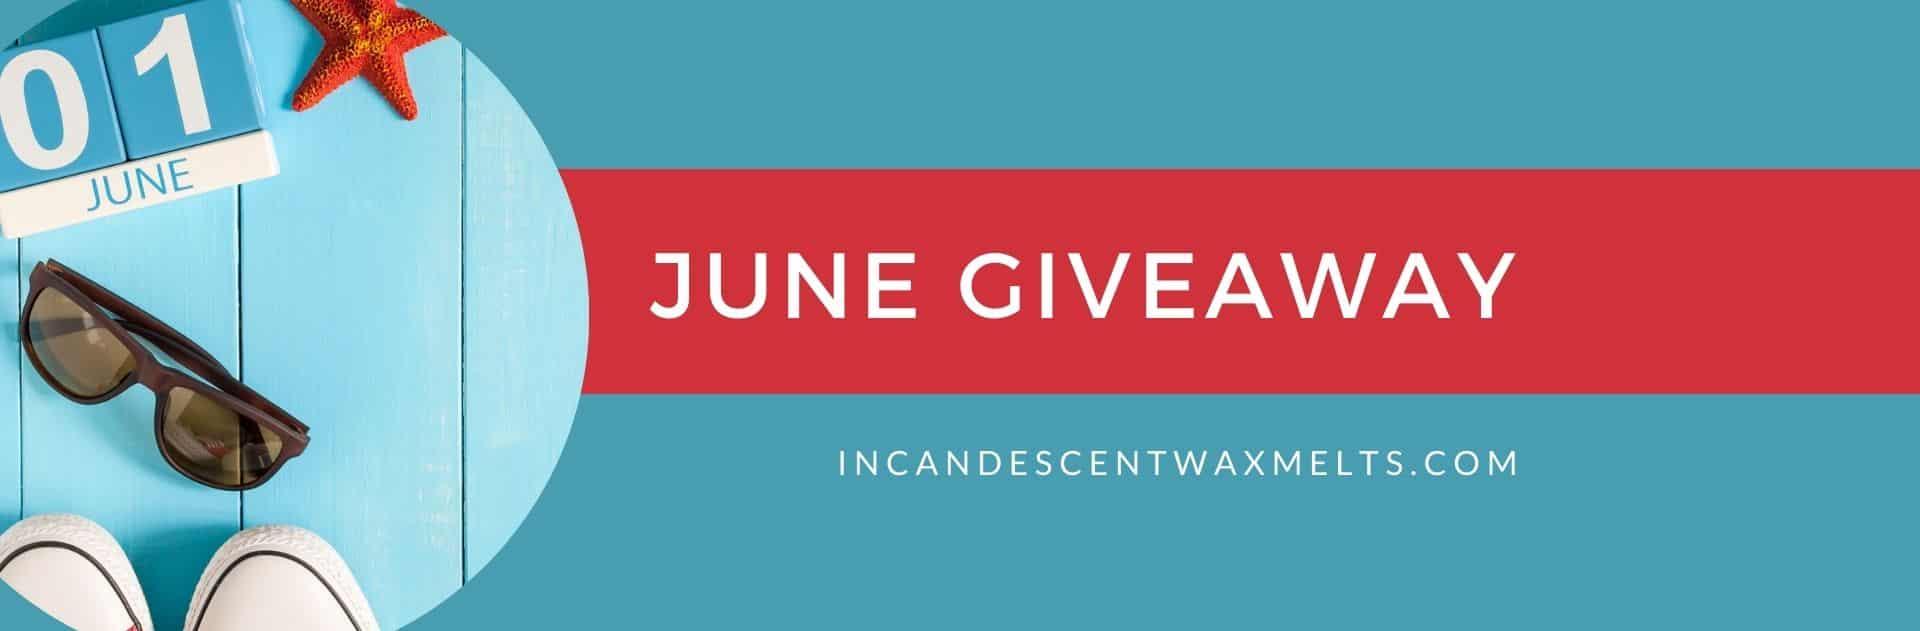 JUNE 2021 GIVEAWAY | Scentsy Giveaway | June 2021 | Incandescent.Scentsy.us